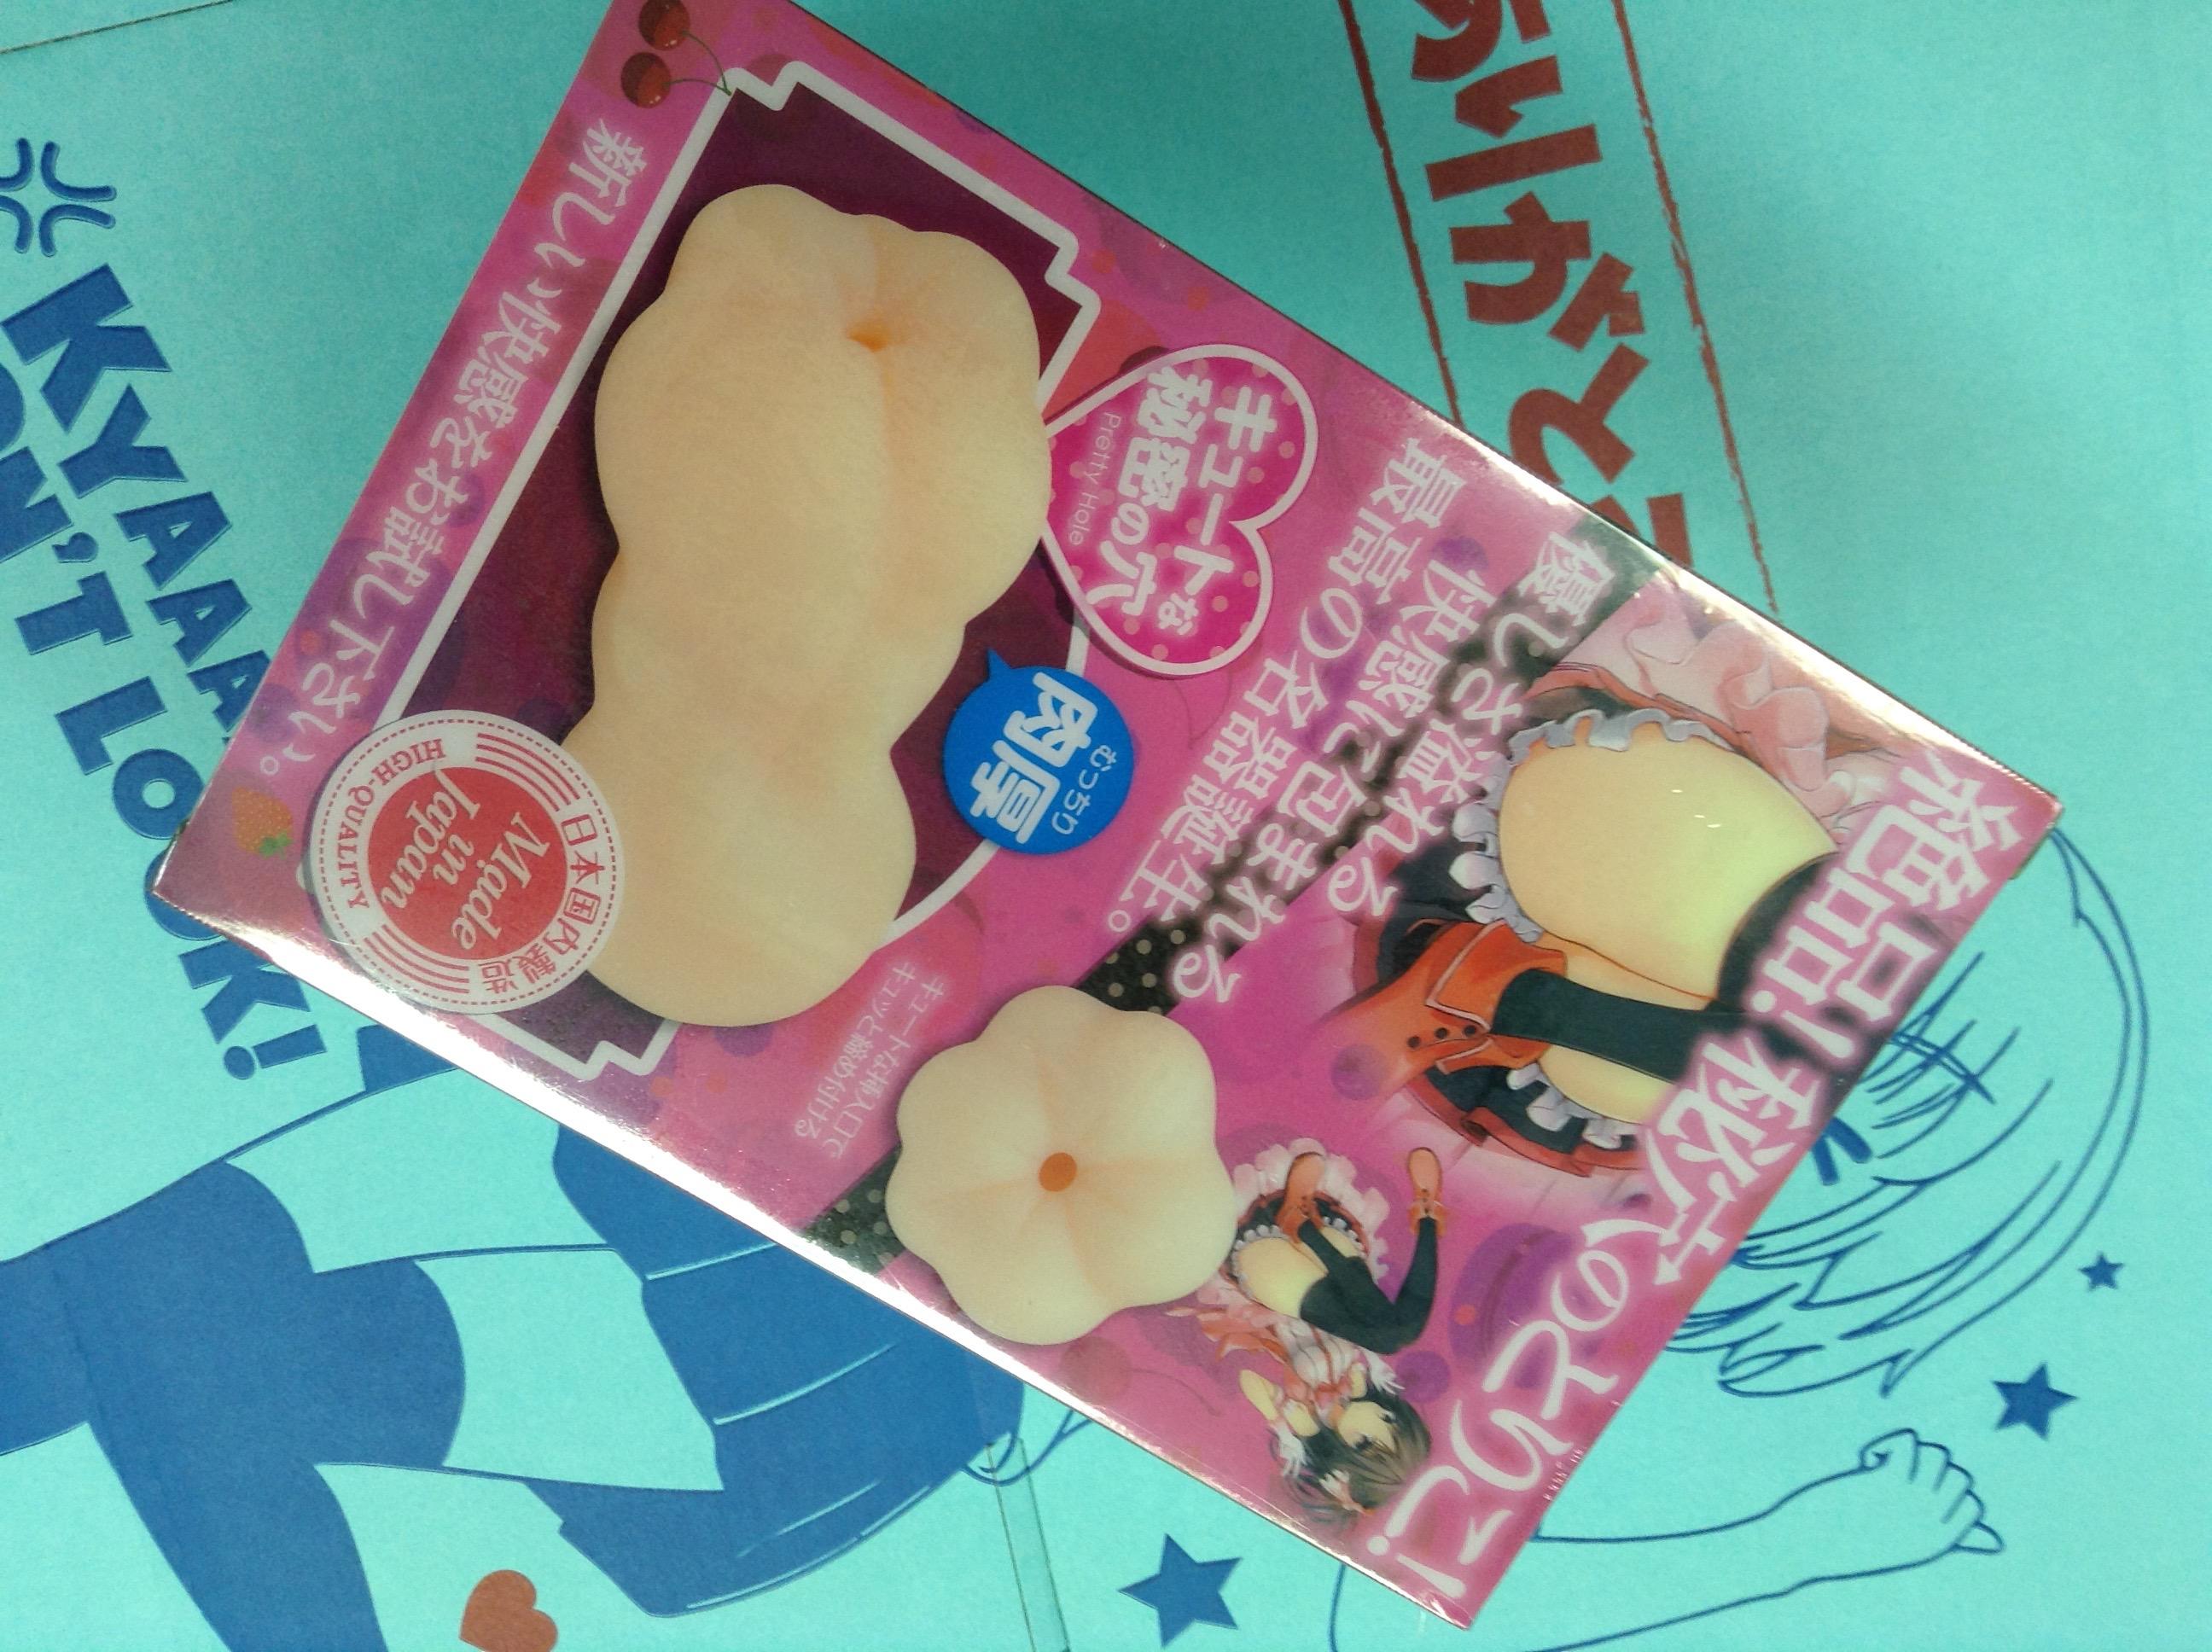 j-list-box-adult-december-edition-0003